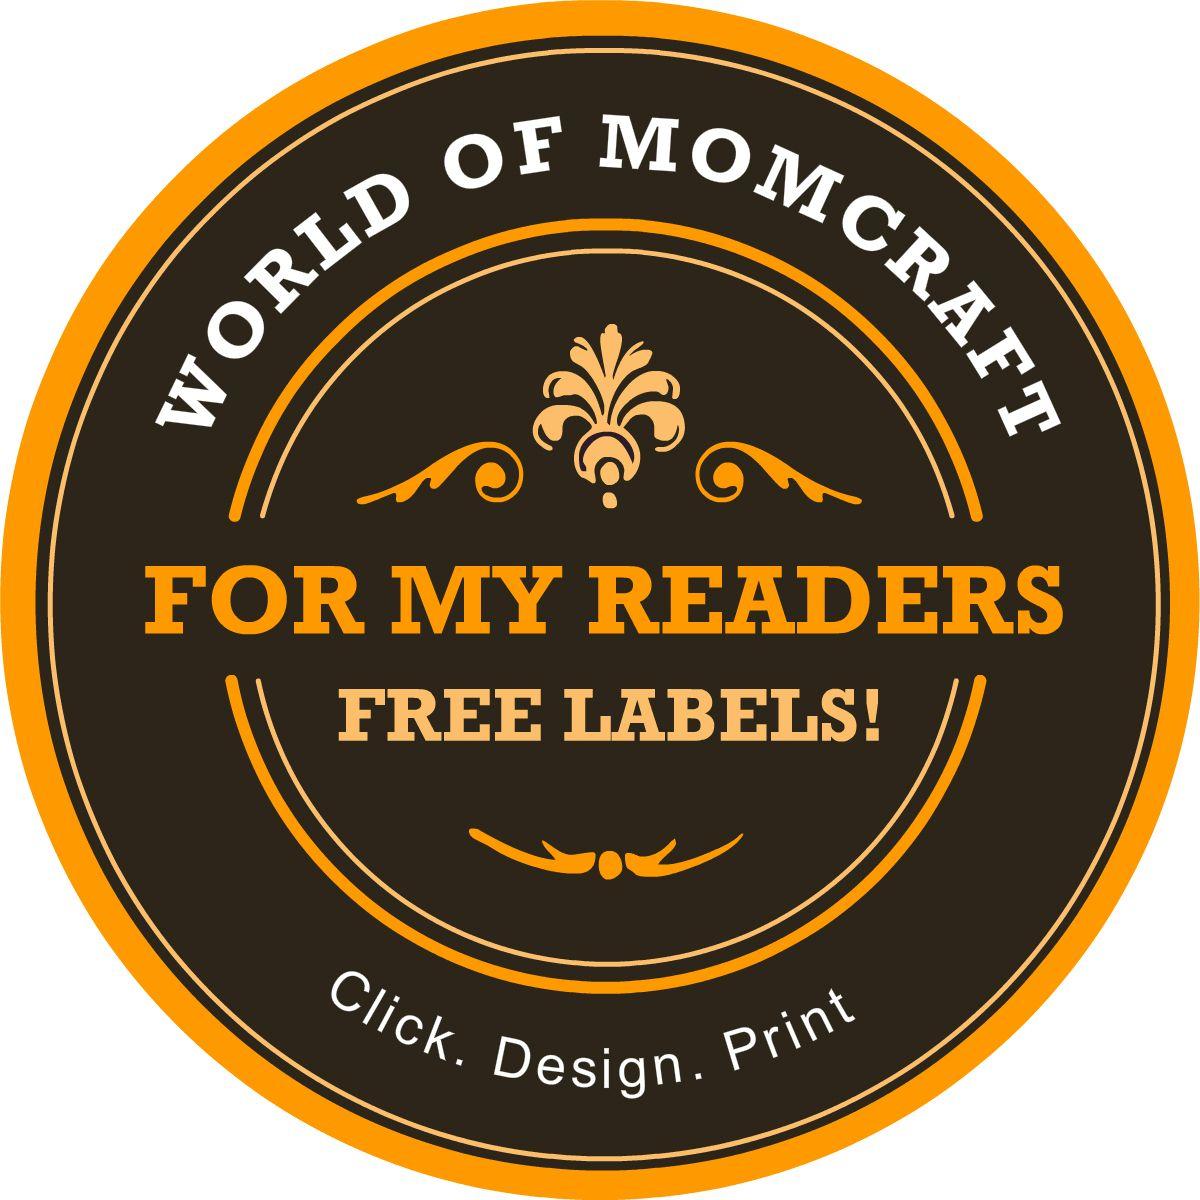 free custom mason jar label maker world of momcraft With jar label maker online free